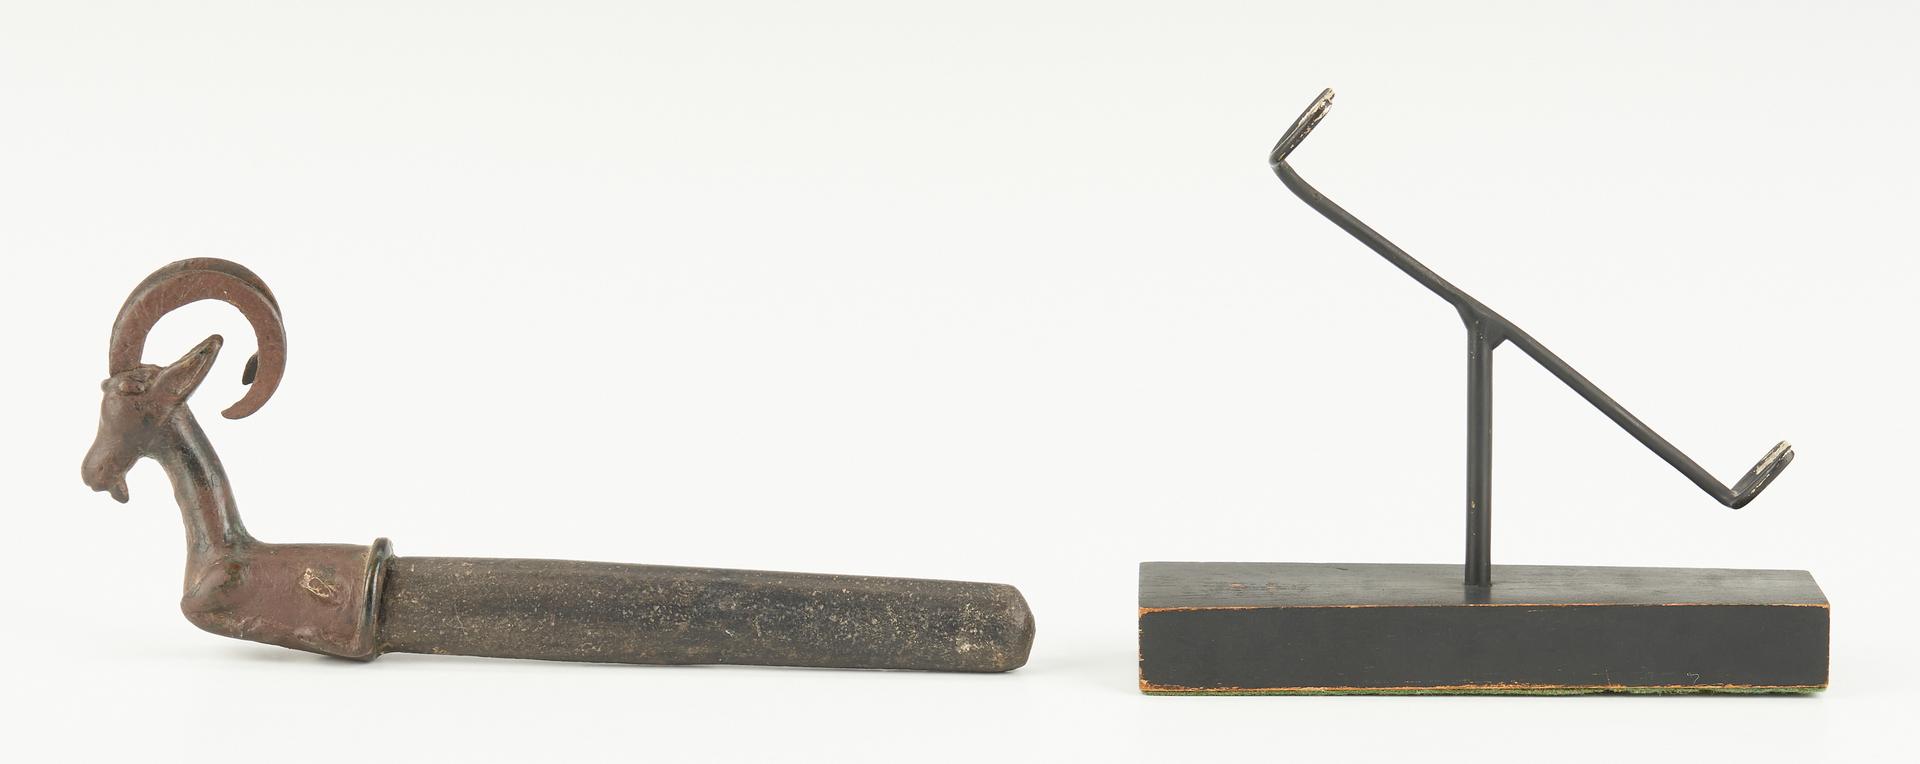 Lot 28: Luristan Whetstone with Bronze Ibex Handle